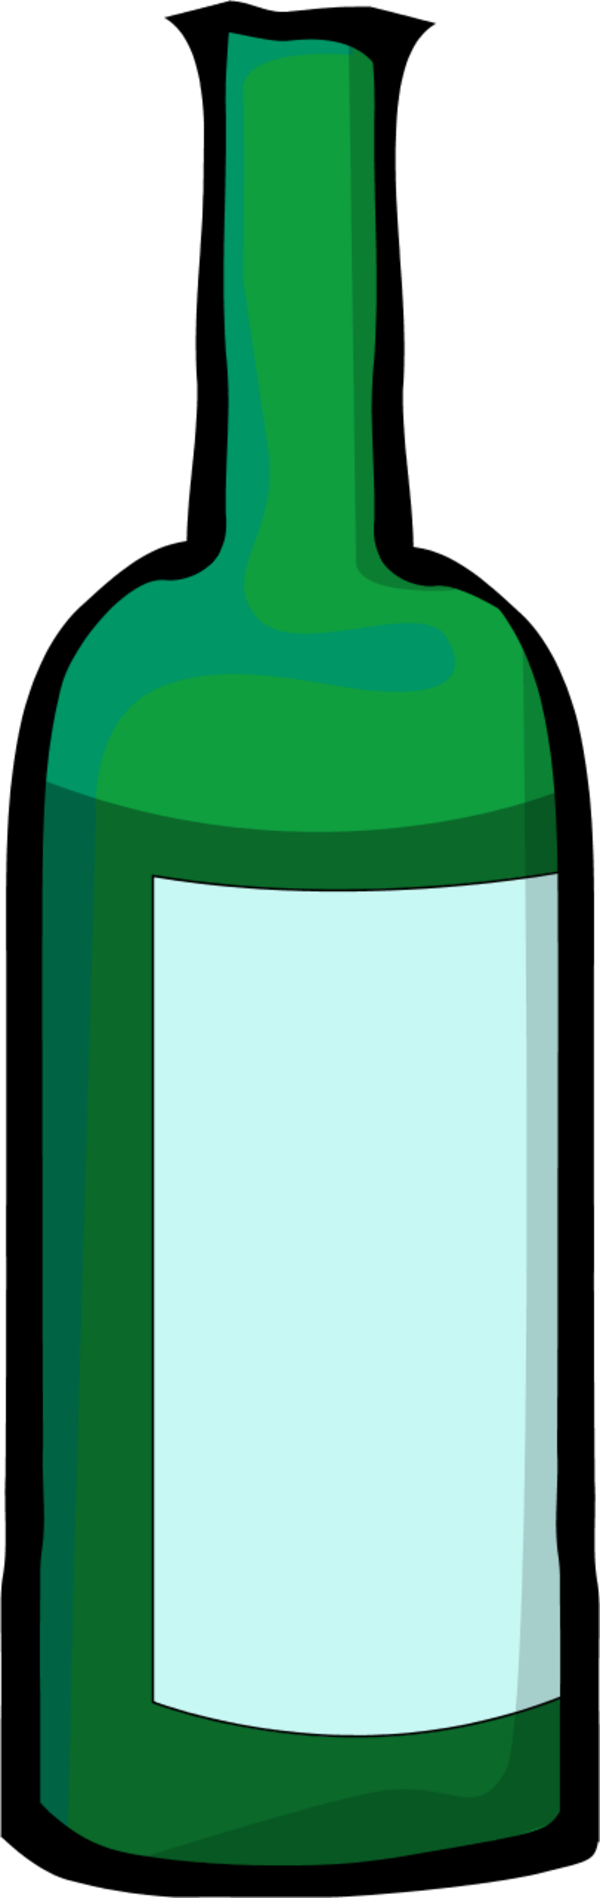 600x1898 Bottle Clipart Green Bottle